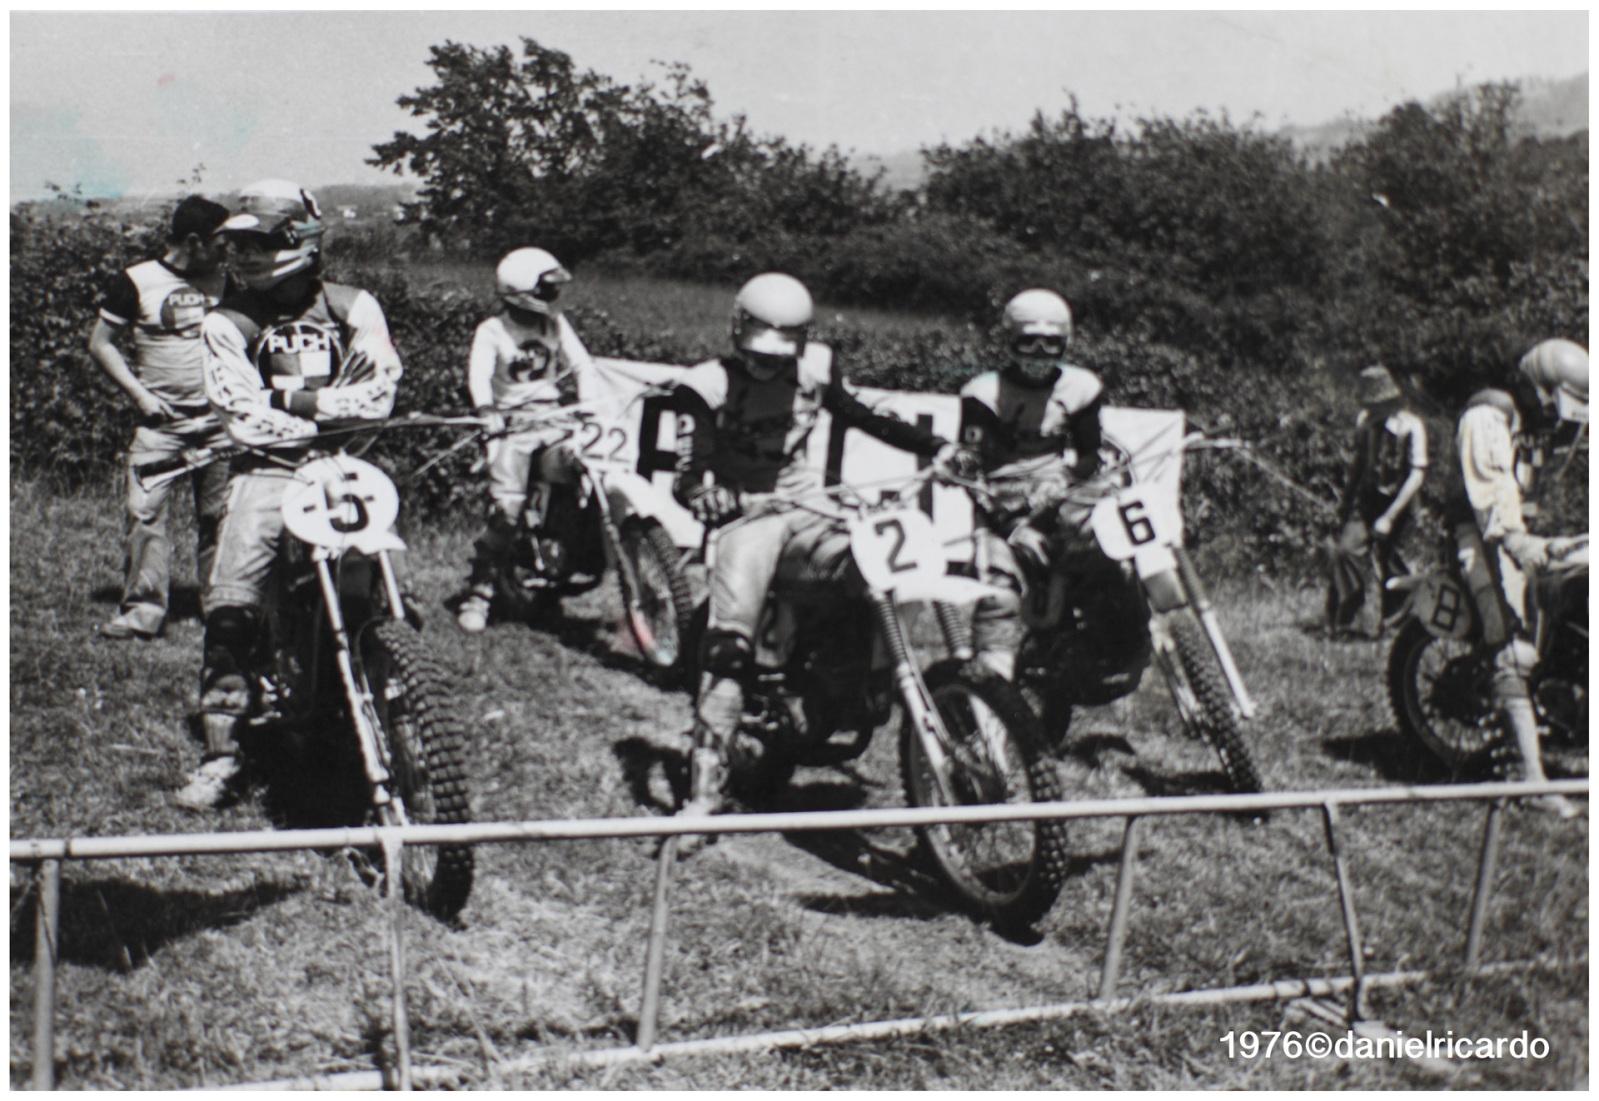 Derbi Cross 75 - La Campeona 1975 25jw1zn